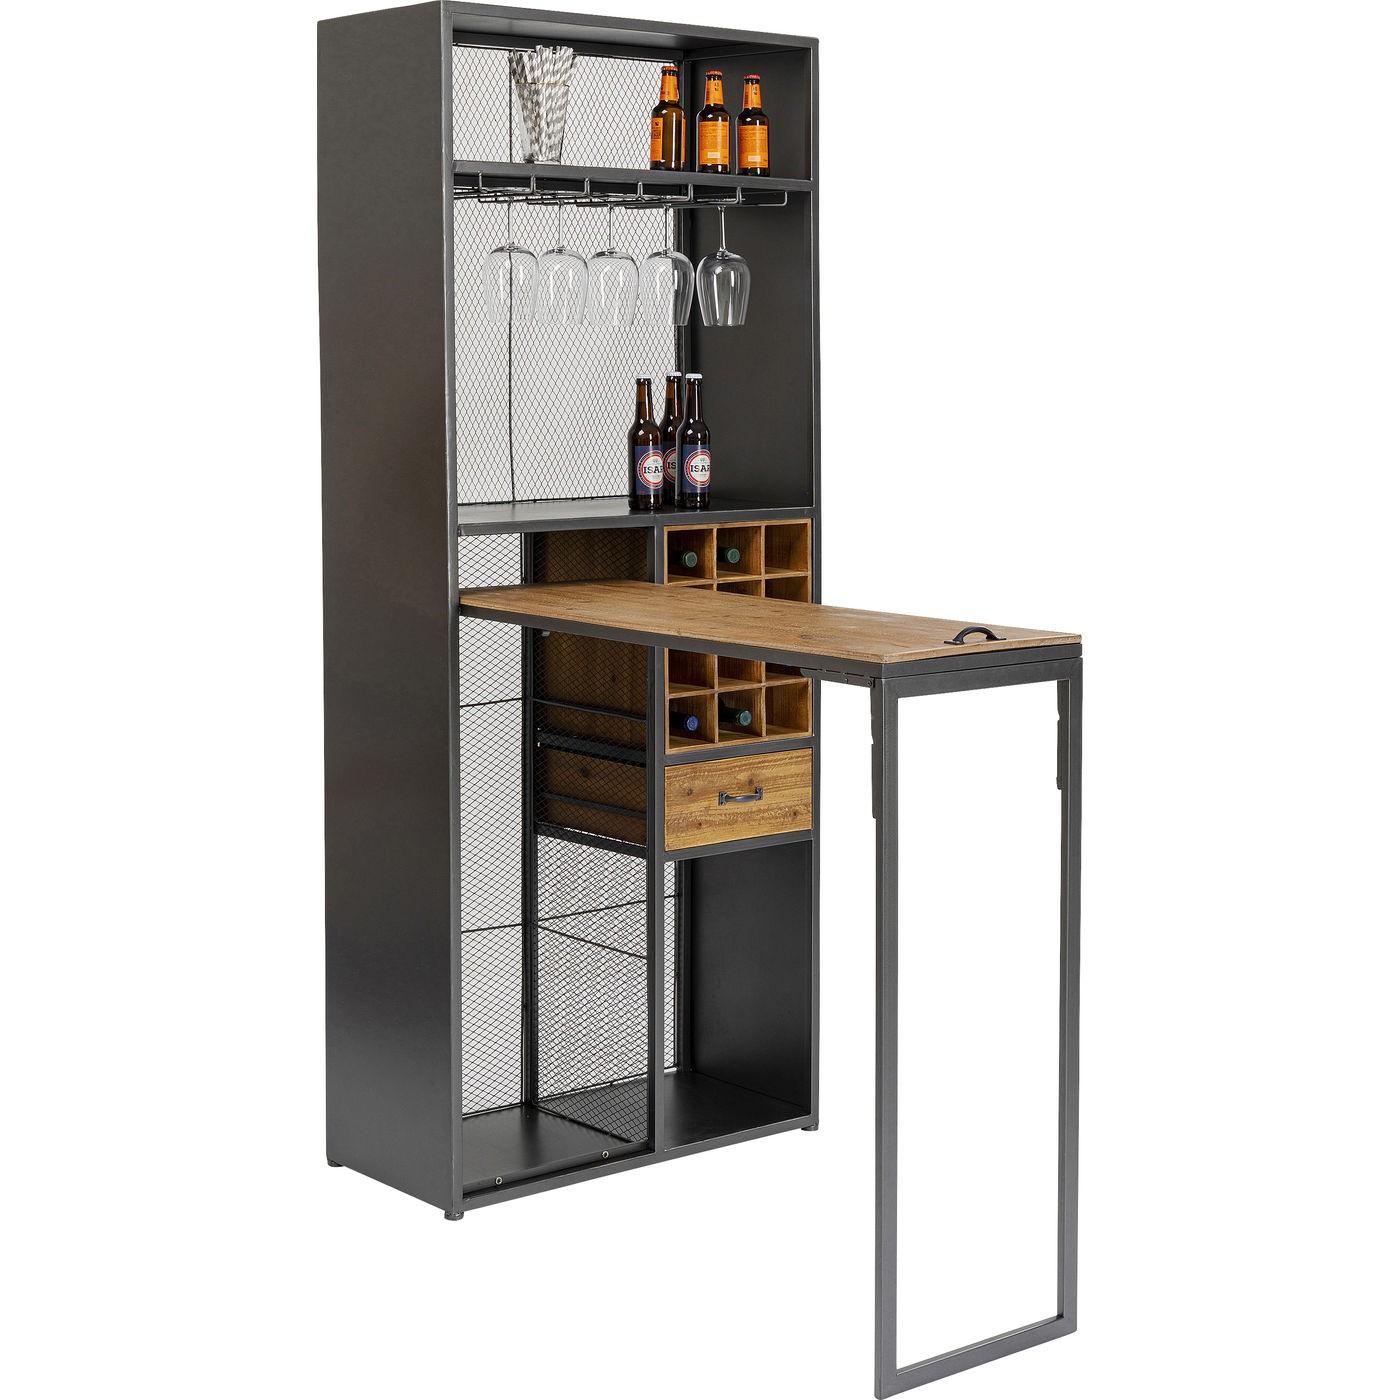 Meuble de bar avec table Vinoteca Kare Design